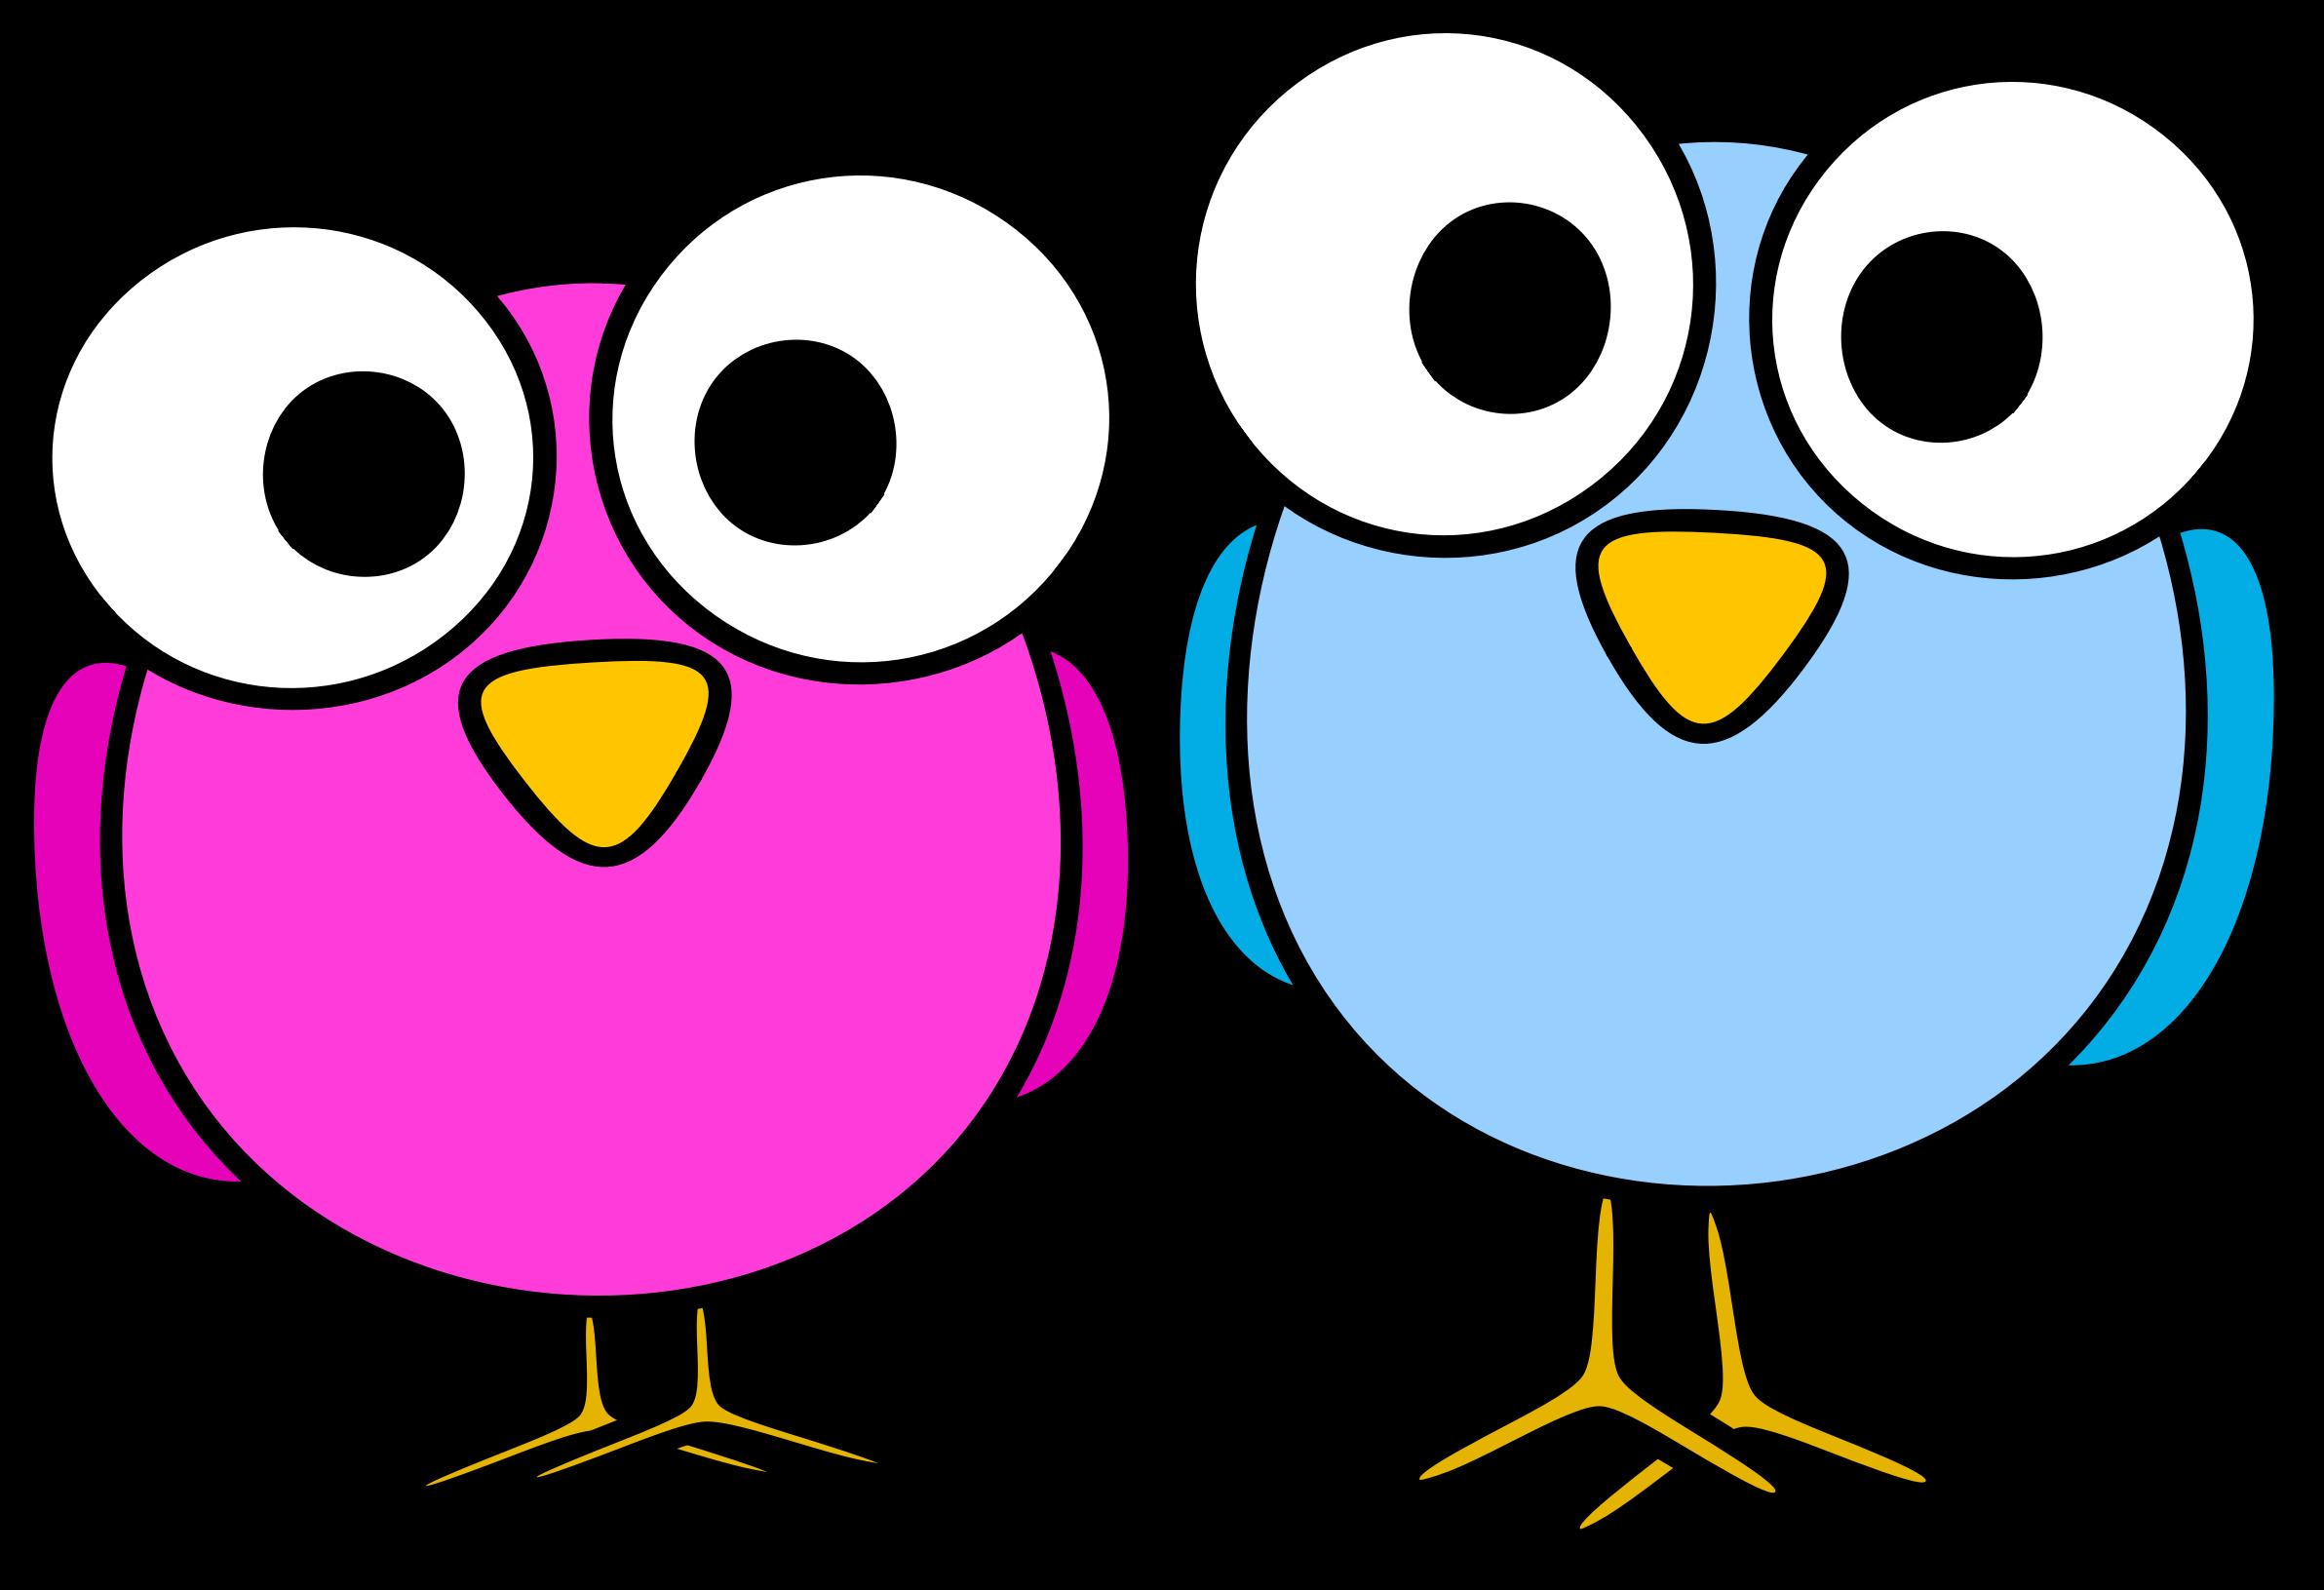 Eyeballs clipart bird eye, Eyeballs bird eye Transparent.